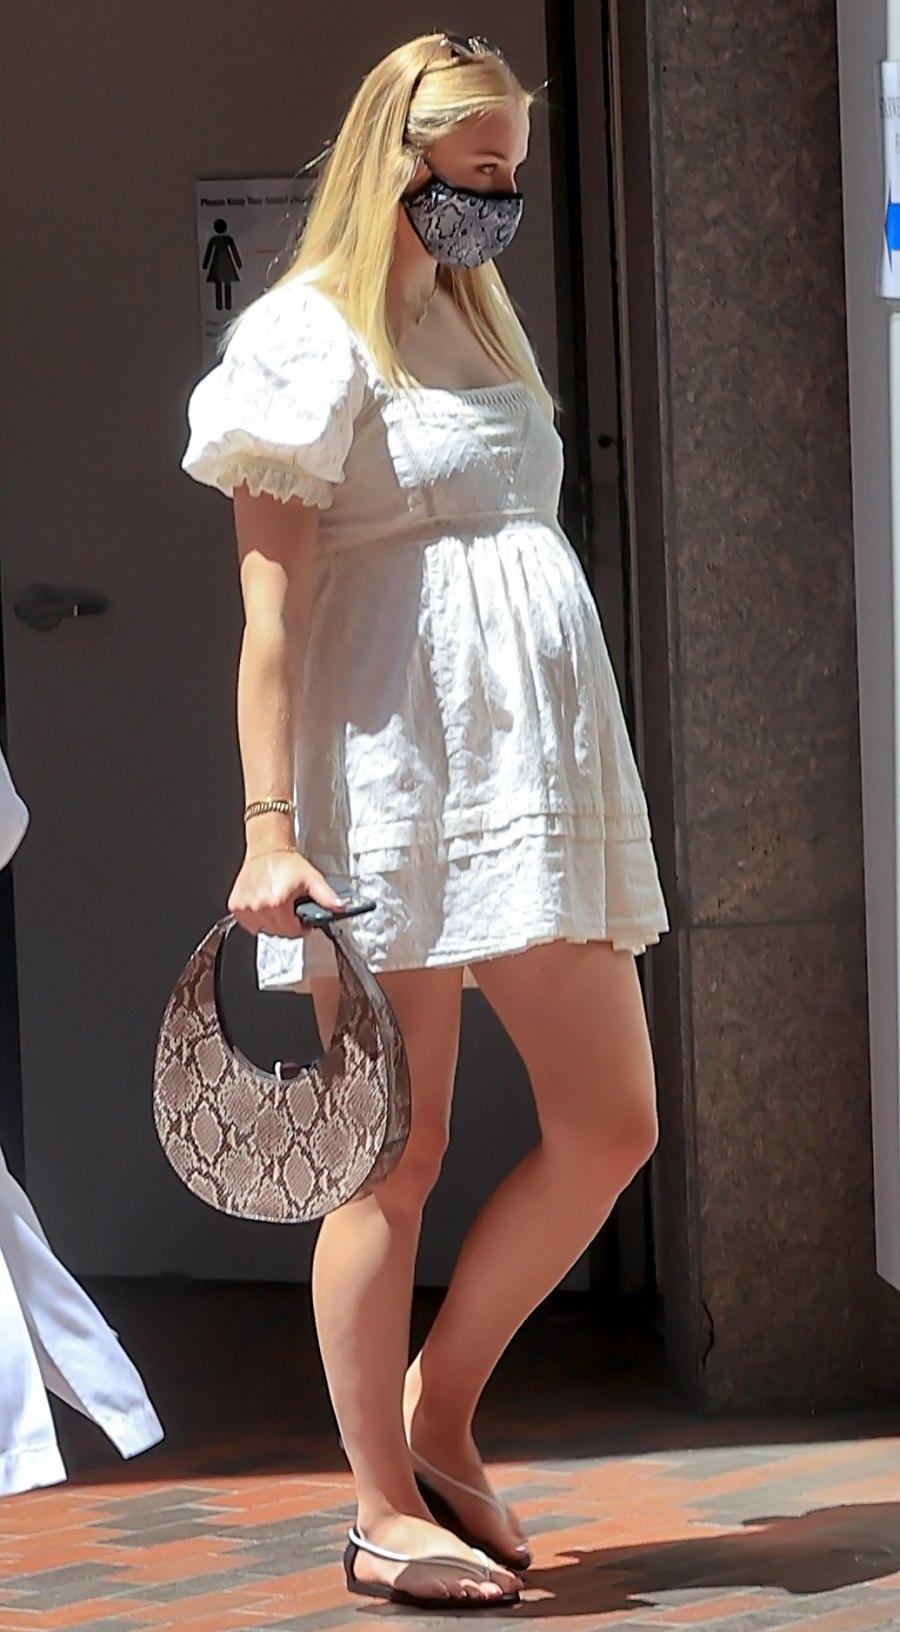 Wearing White Sophie Turner Pregnancy Pics Ahead of Her, Joe Jonas' Child